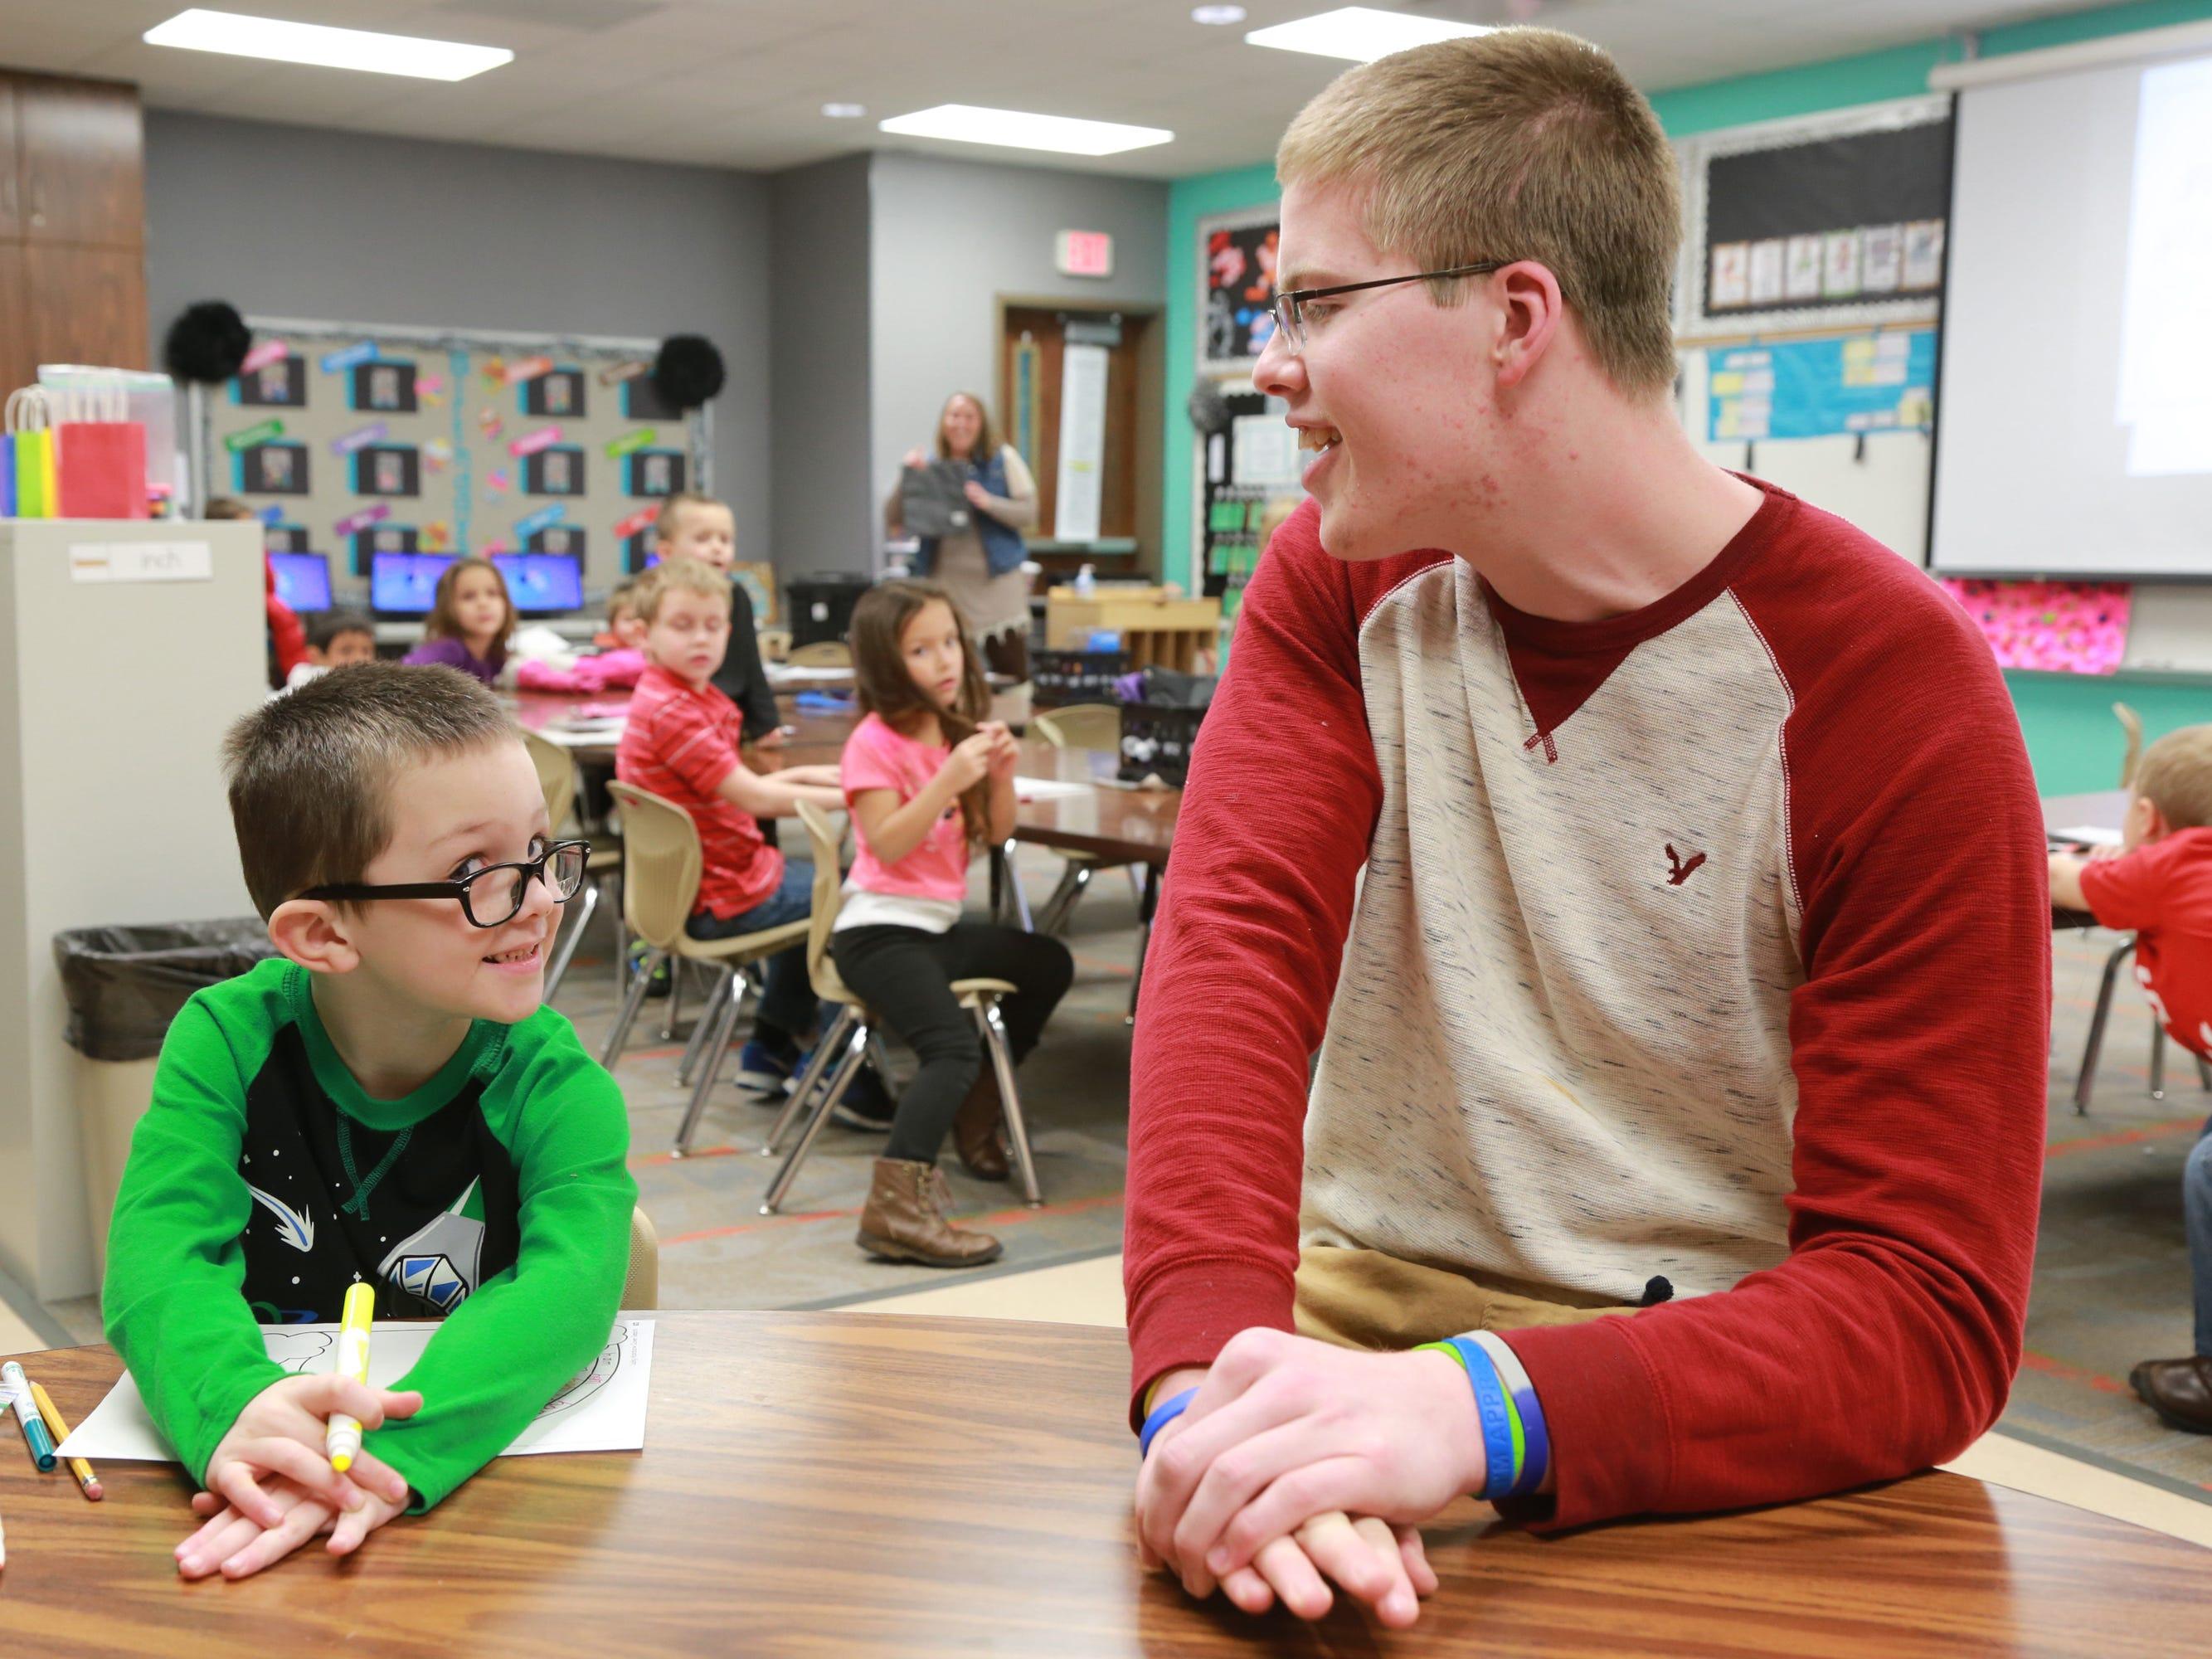 Former Columbus North basketball player Josh Speidel  has volunteered at  Brown Elementary in Seymour.